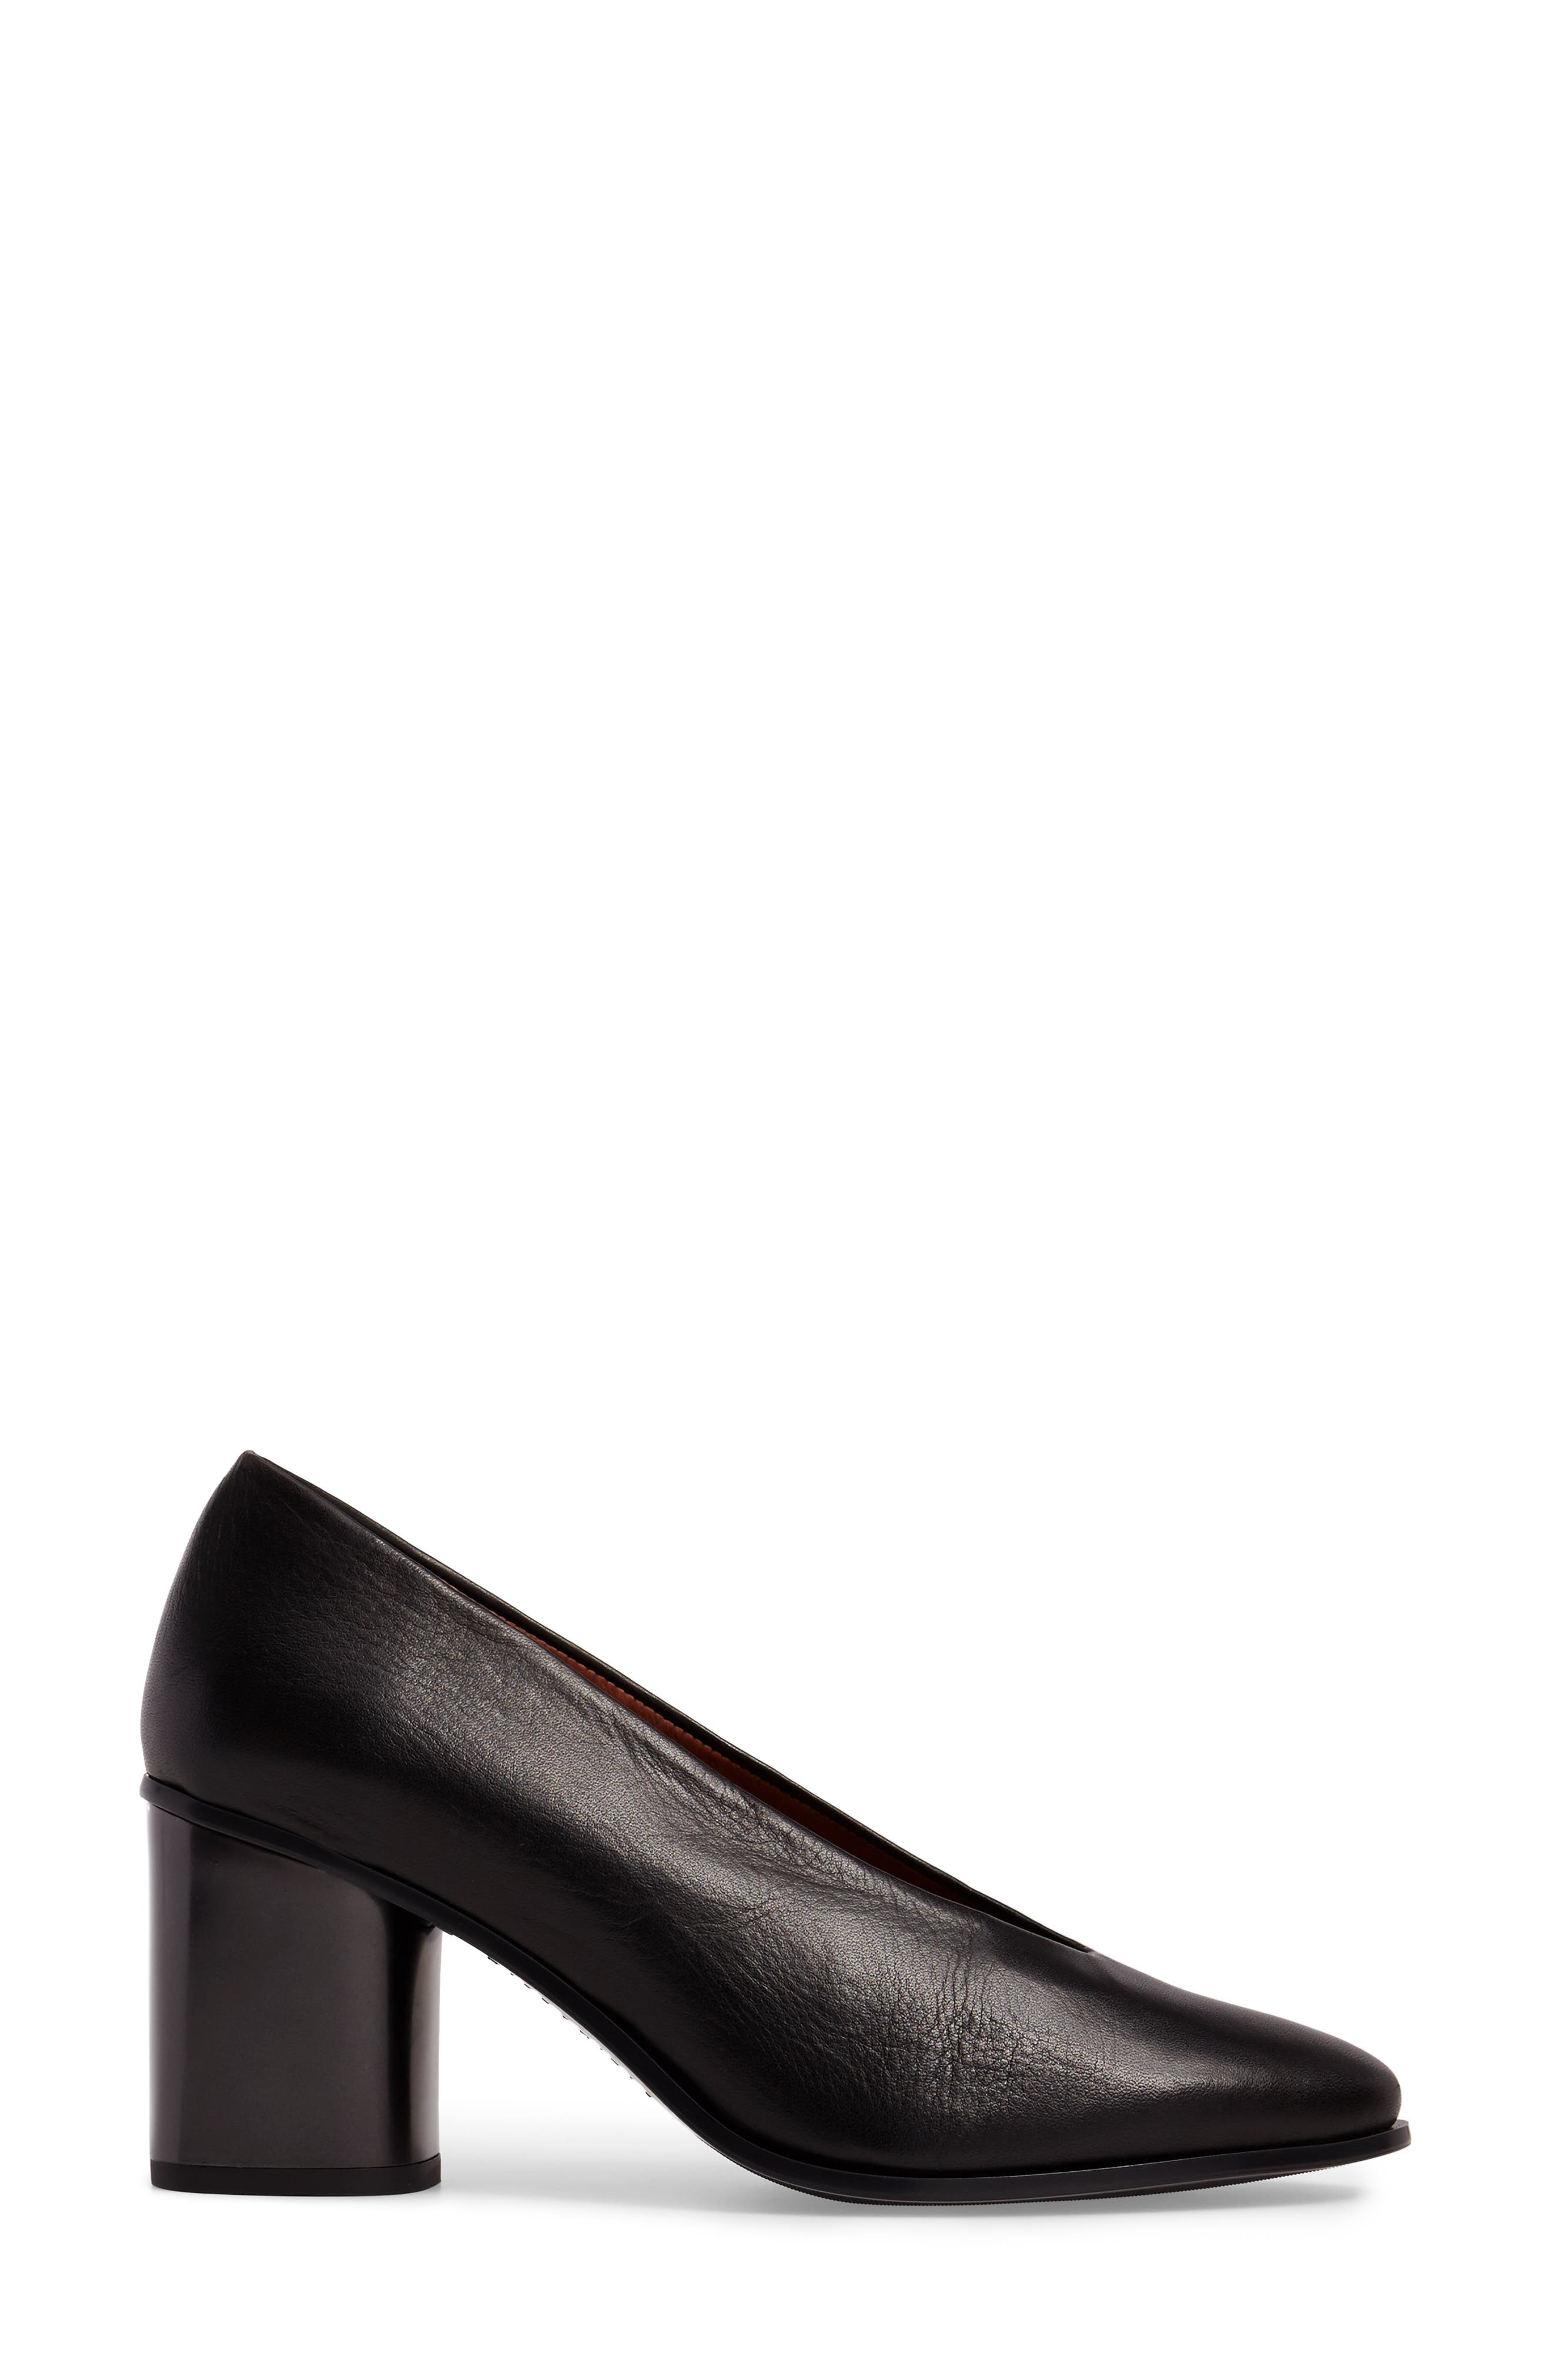 Maddie Block Heel Pump,                             Alternate thumbnail 3, color,                             Soho Black Leather